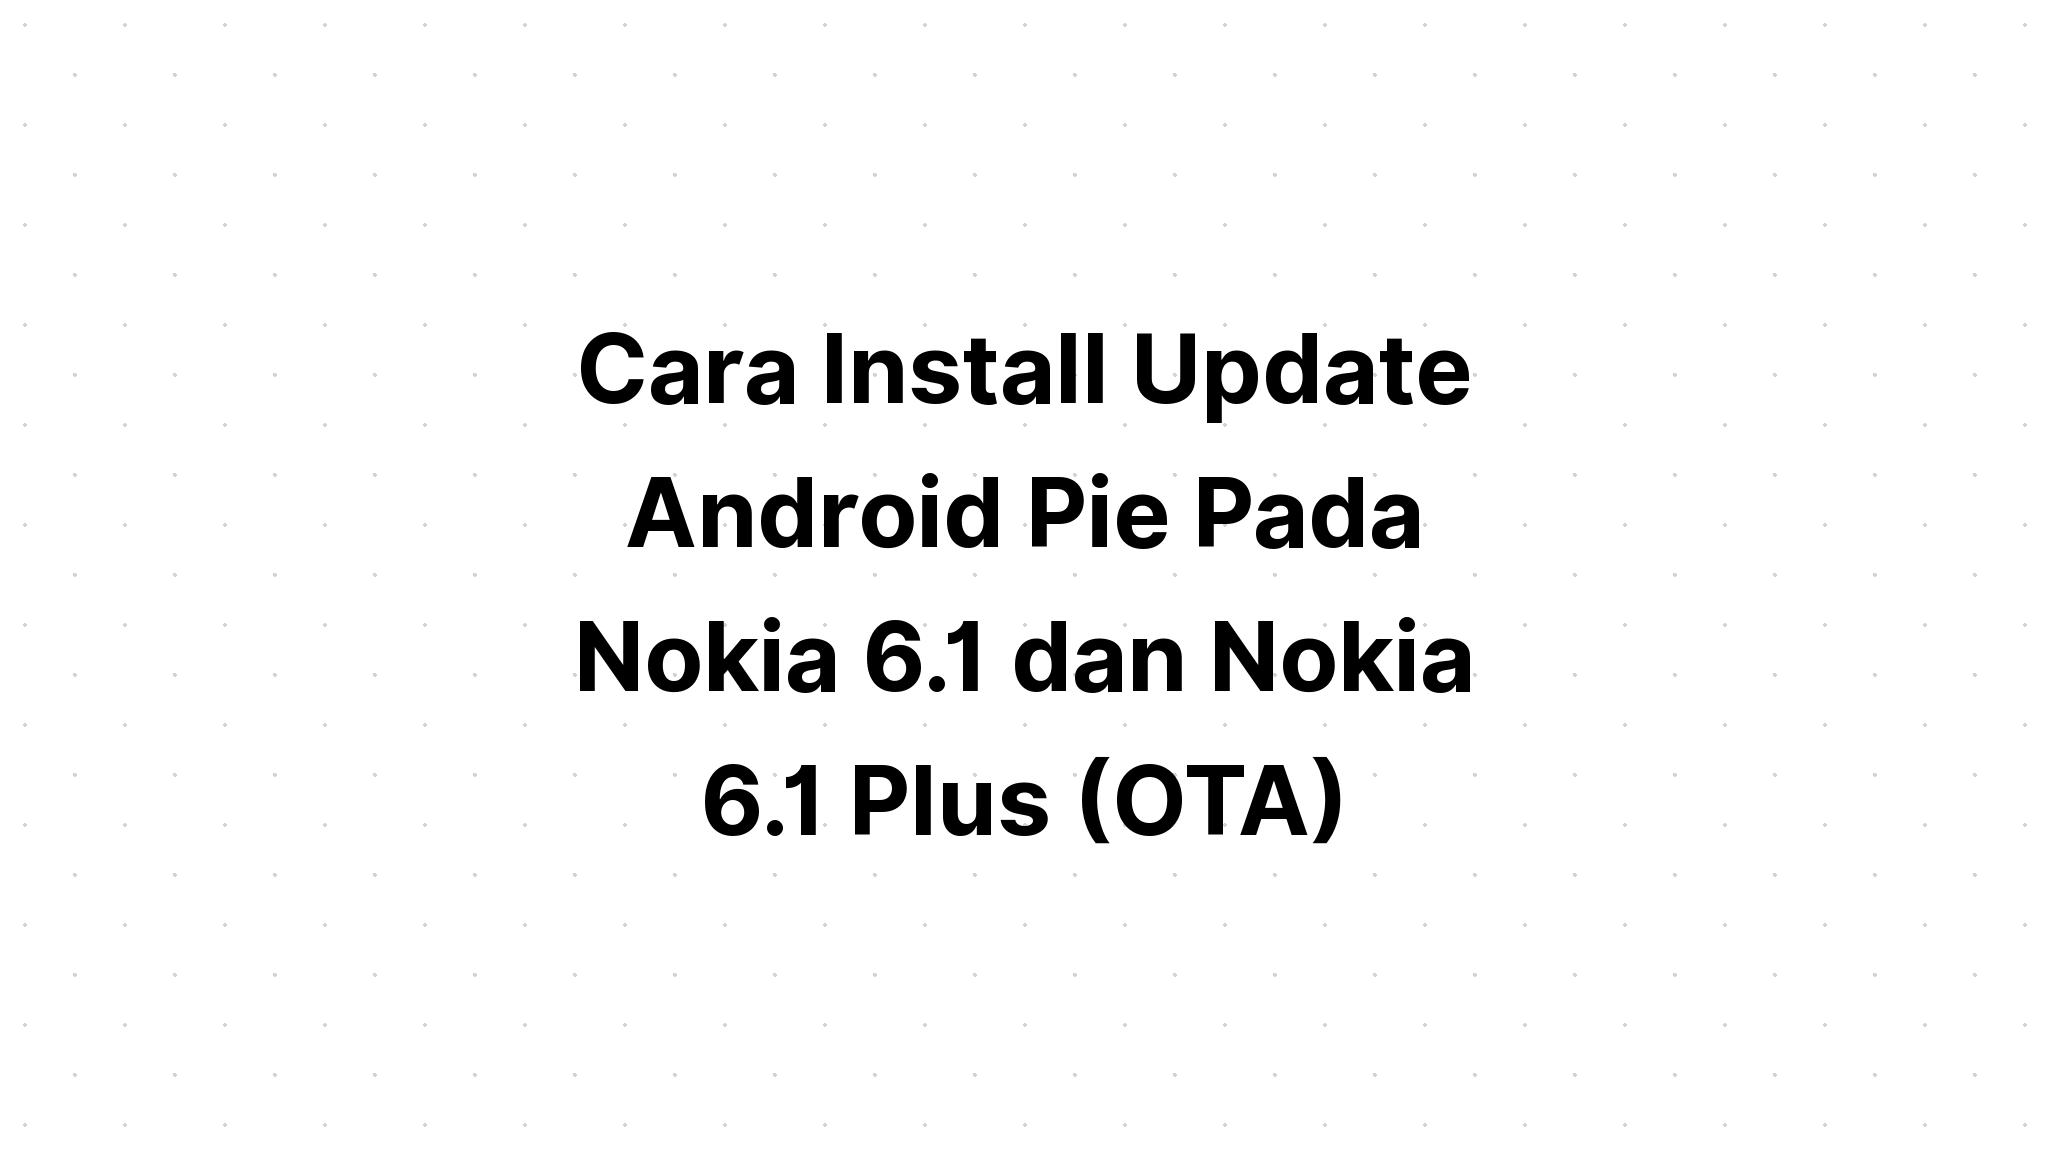 Cara Install Update Android Pie Pada Nokia 6.1 dan Nokia 6